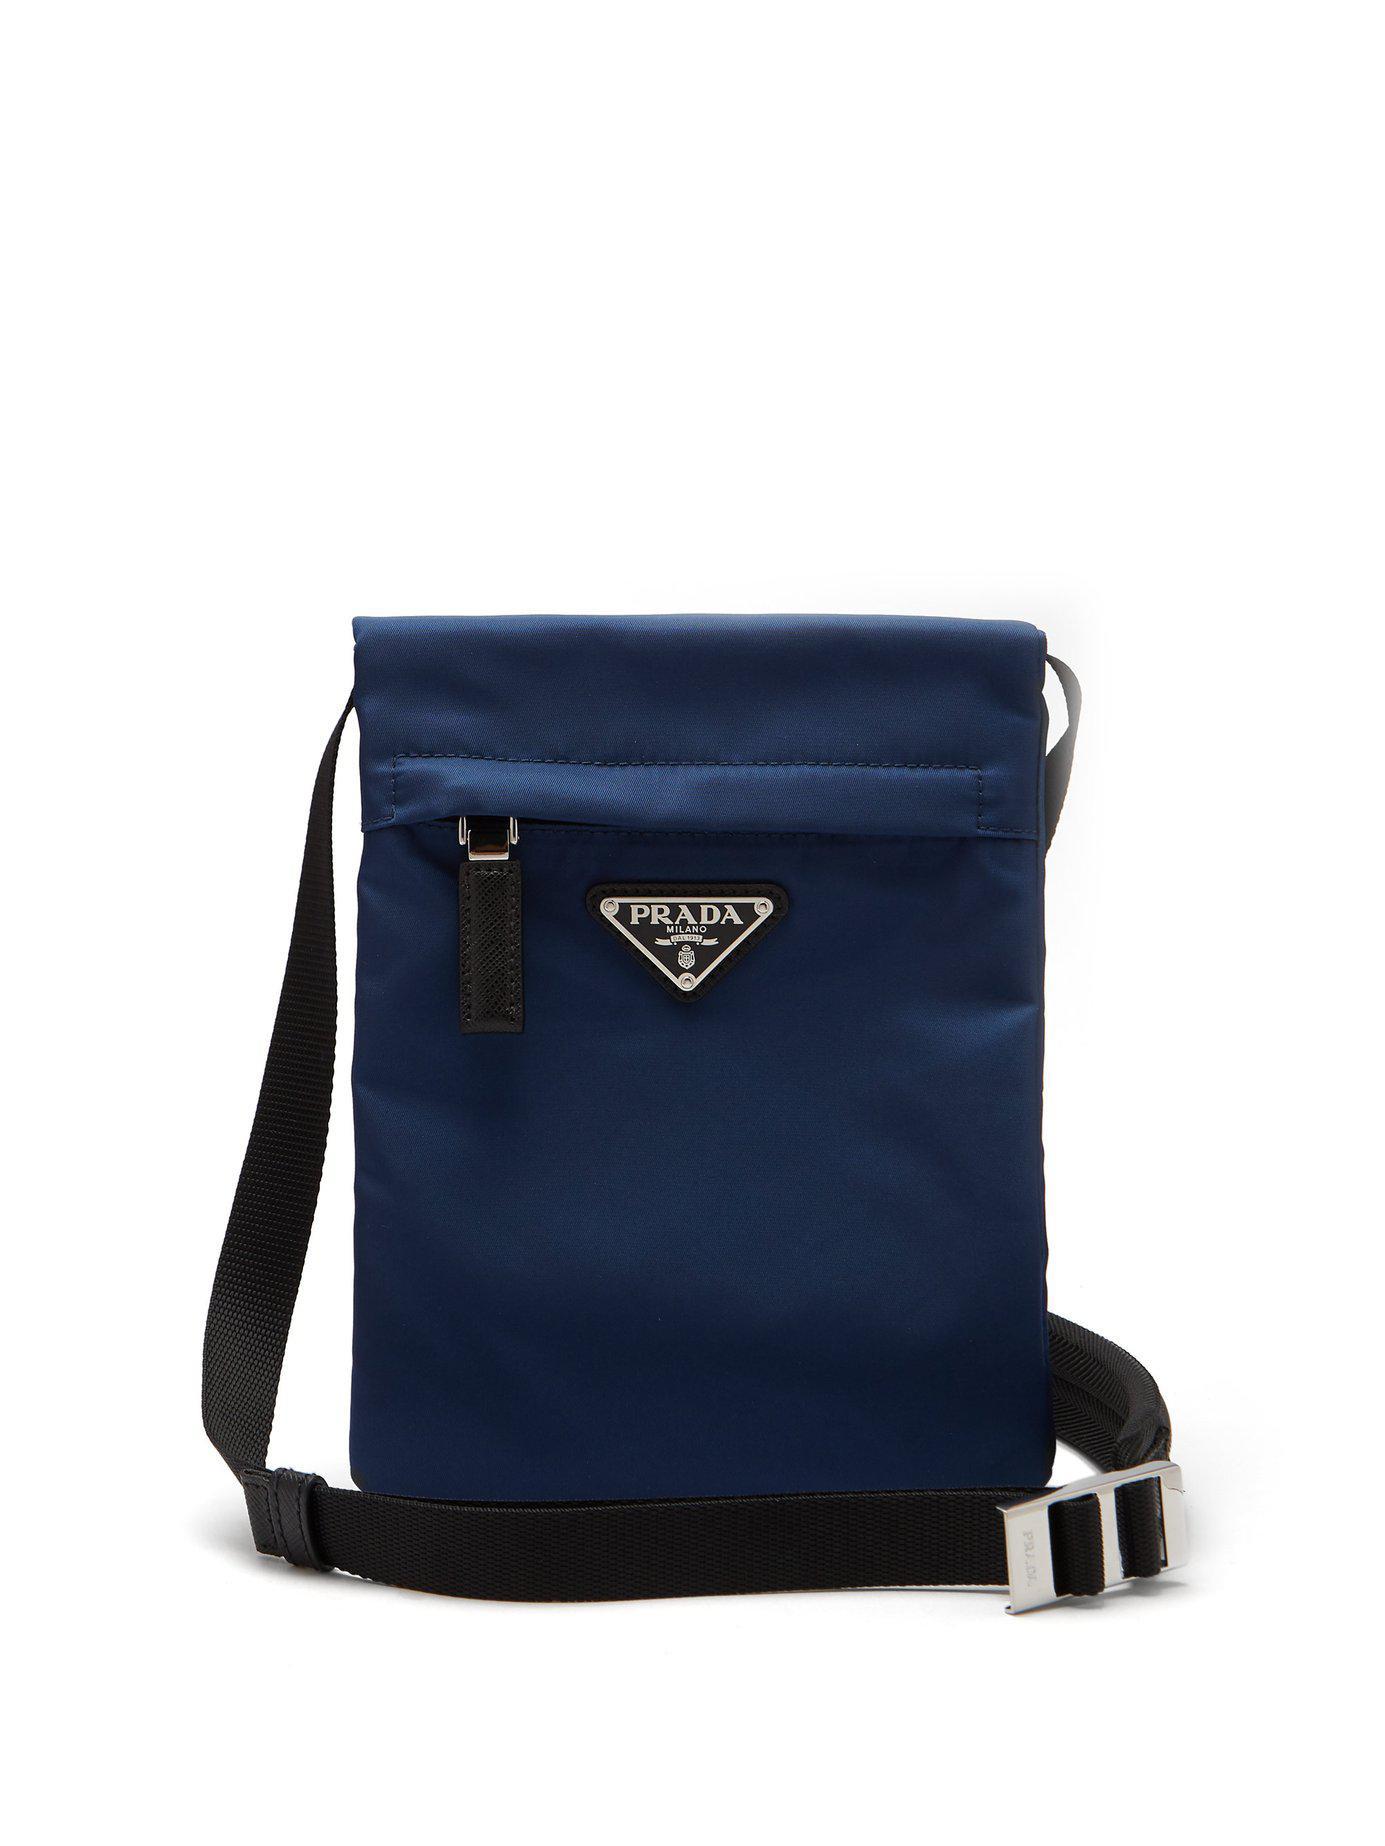 Prada - Blue Nylon Cross Body Bag for Men - Lyst. View fullscreen 88fff4aeea17e